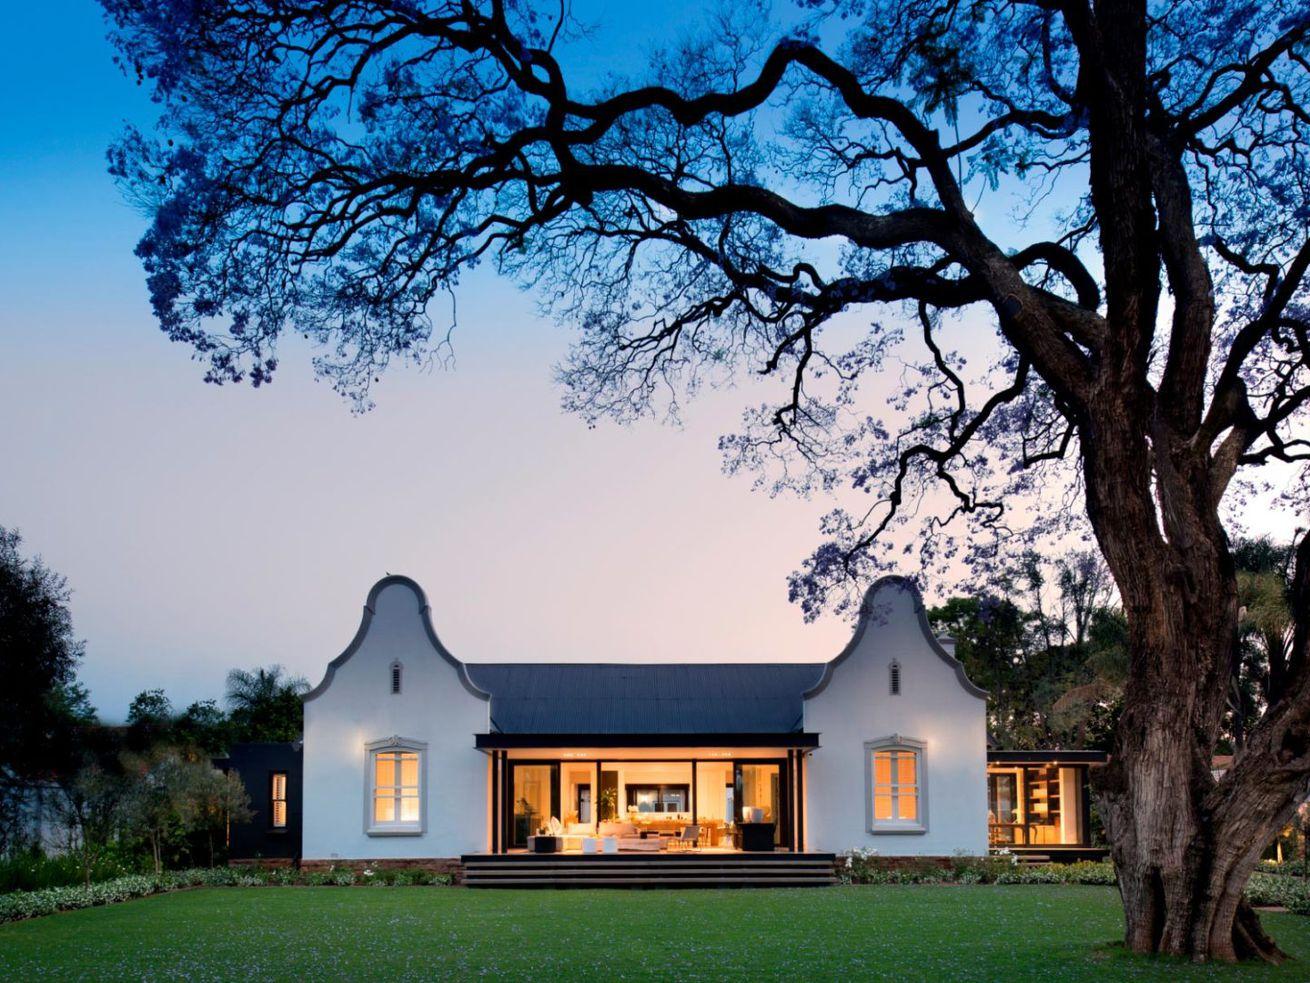 Renovated farmhouse keeps its Cape Dutch style